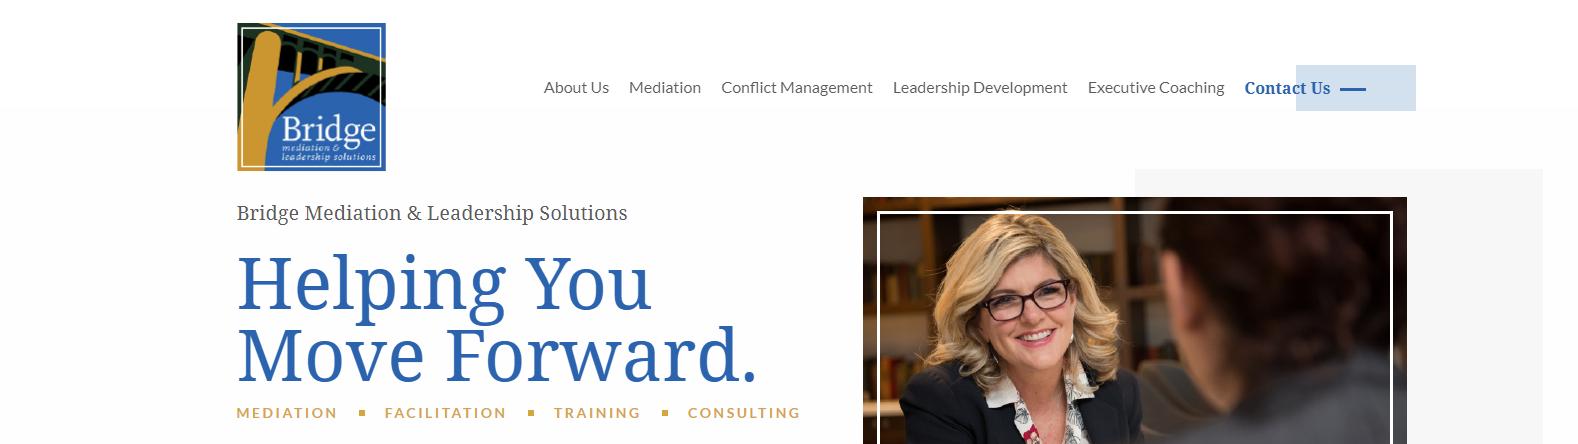 Bridge Mediation and Leadership Solutions